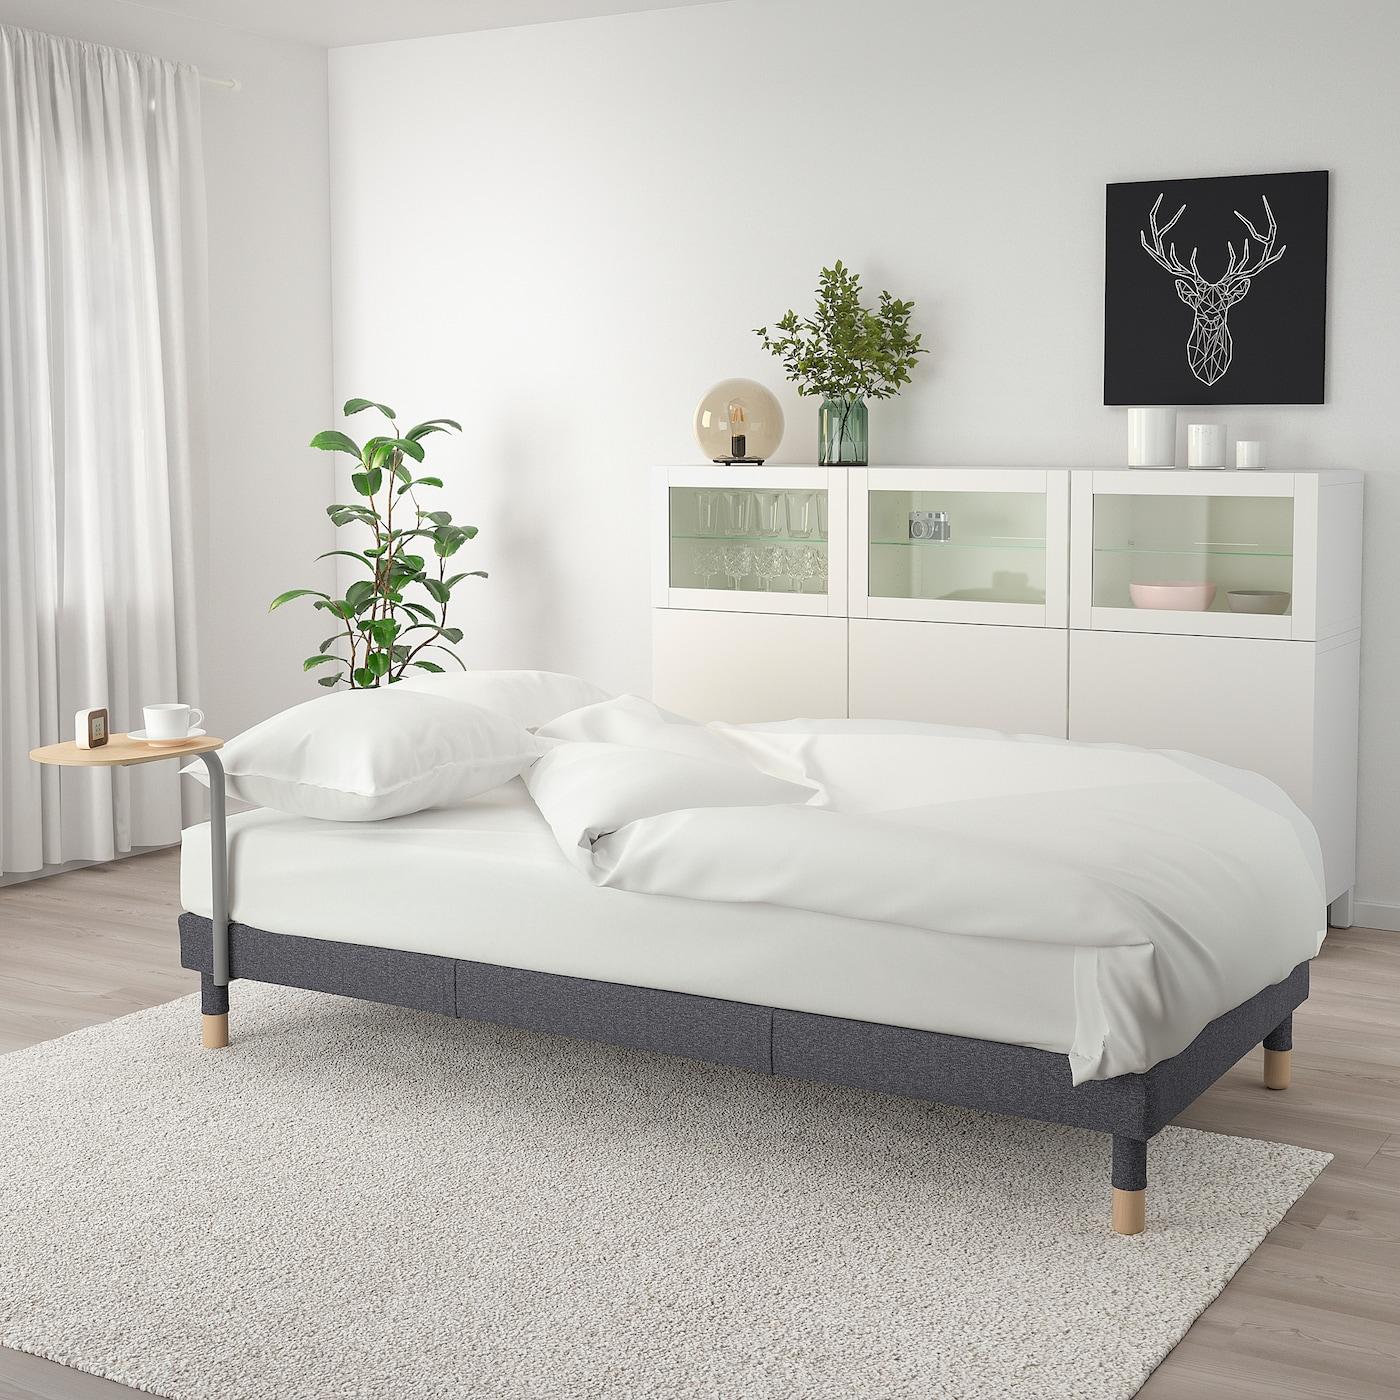 FLOTTEBO Sofa-bed with side table - Gunnared medium grey 3 cm